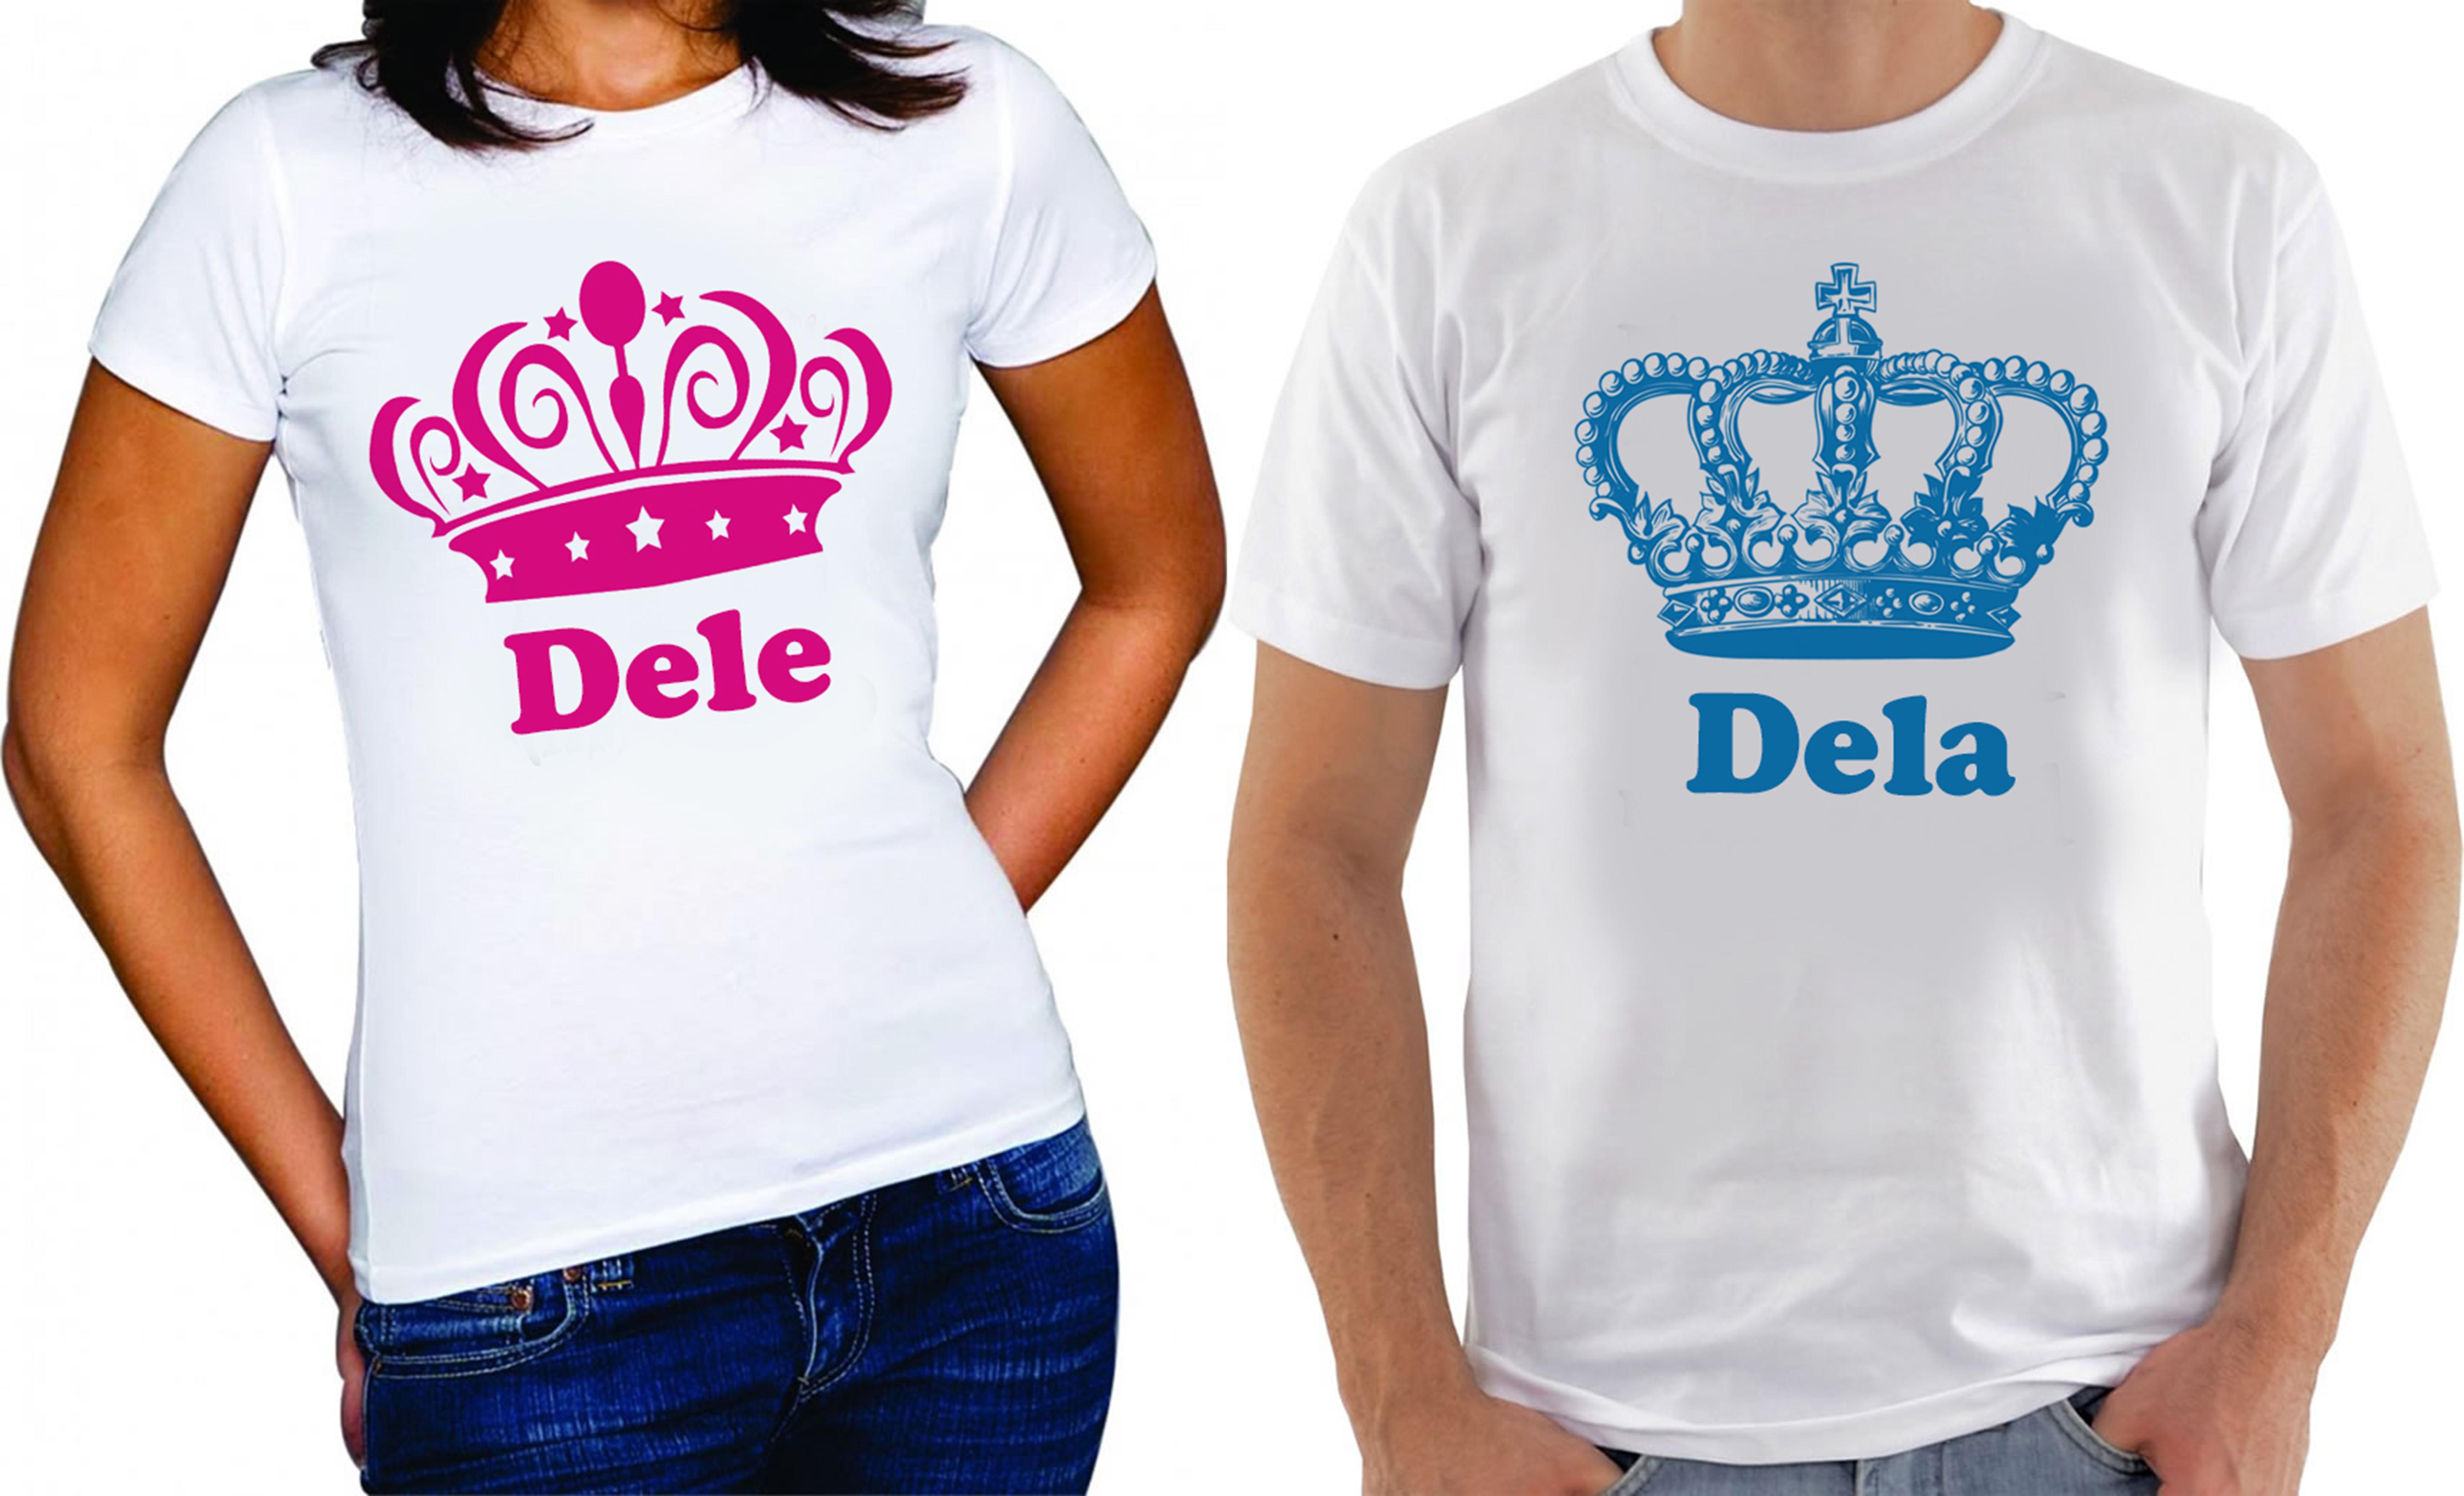 11880bdc27 Camiseta amostra grtis Estampas maneiras t Frases